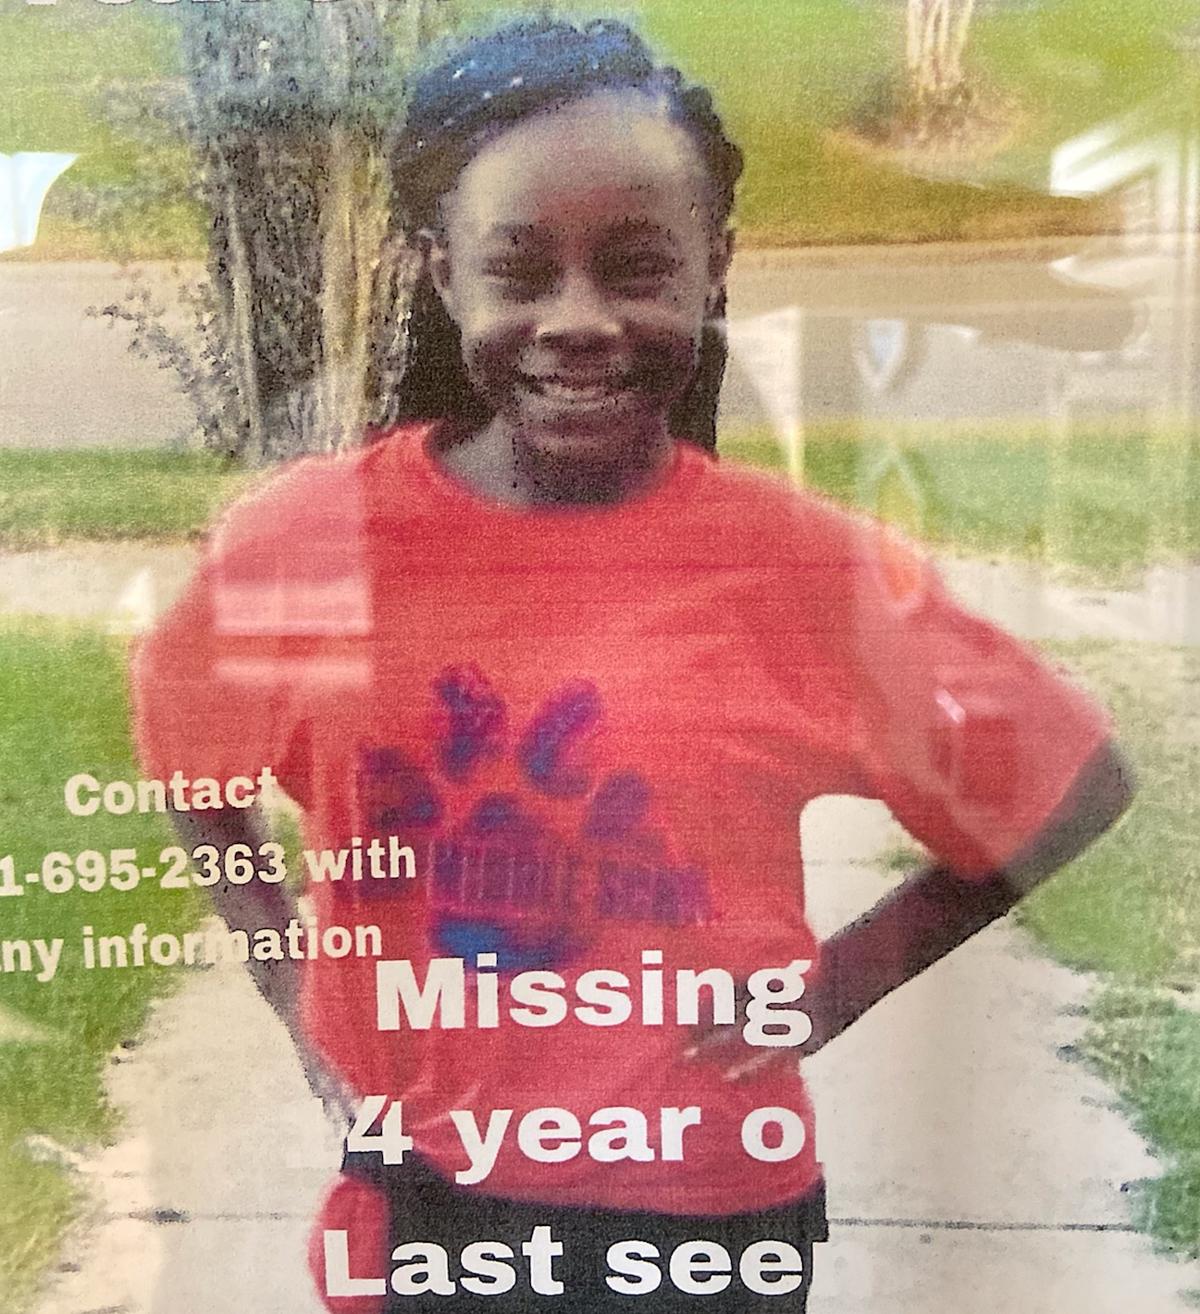 Missing/Endangered Child alert